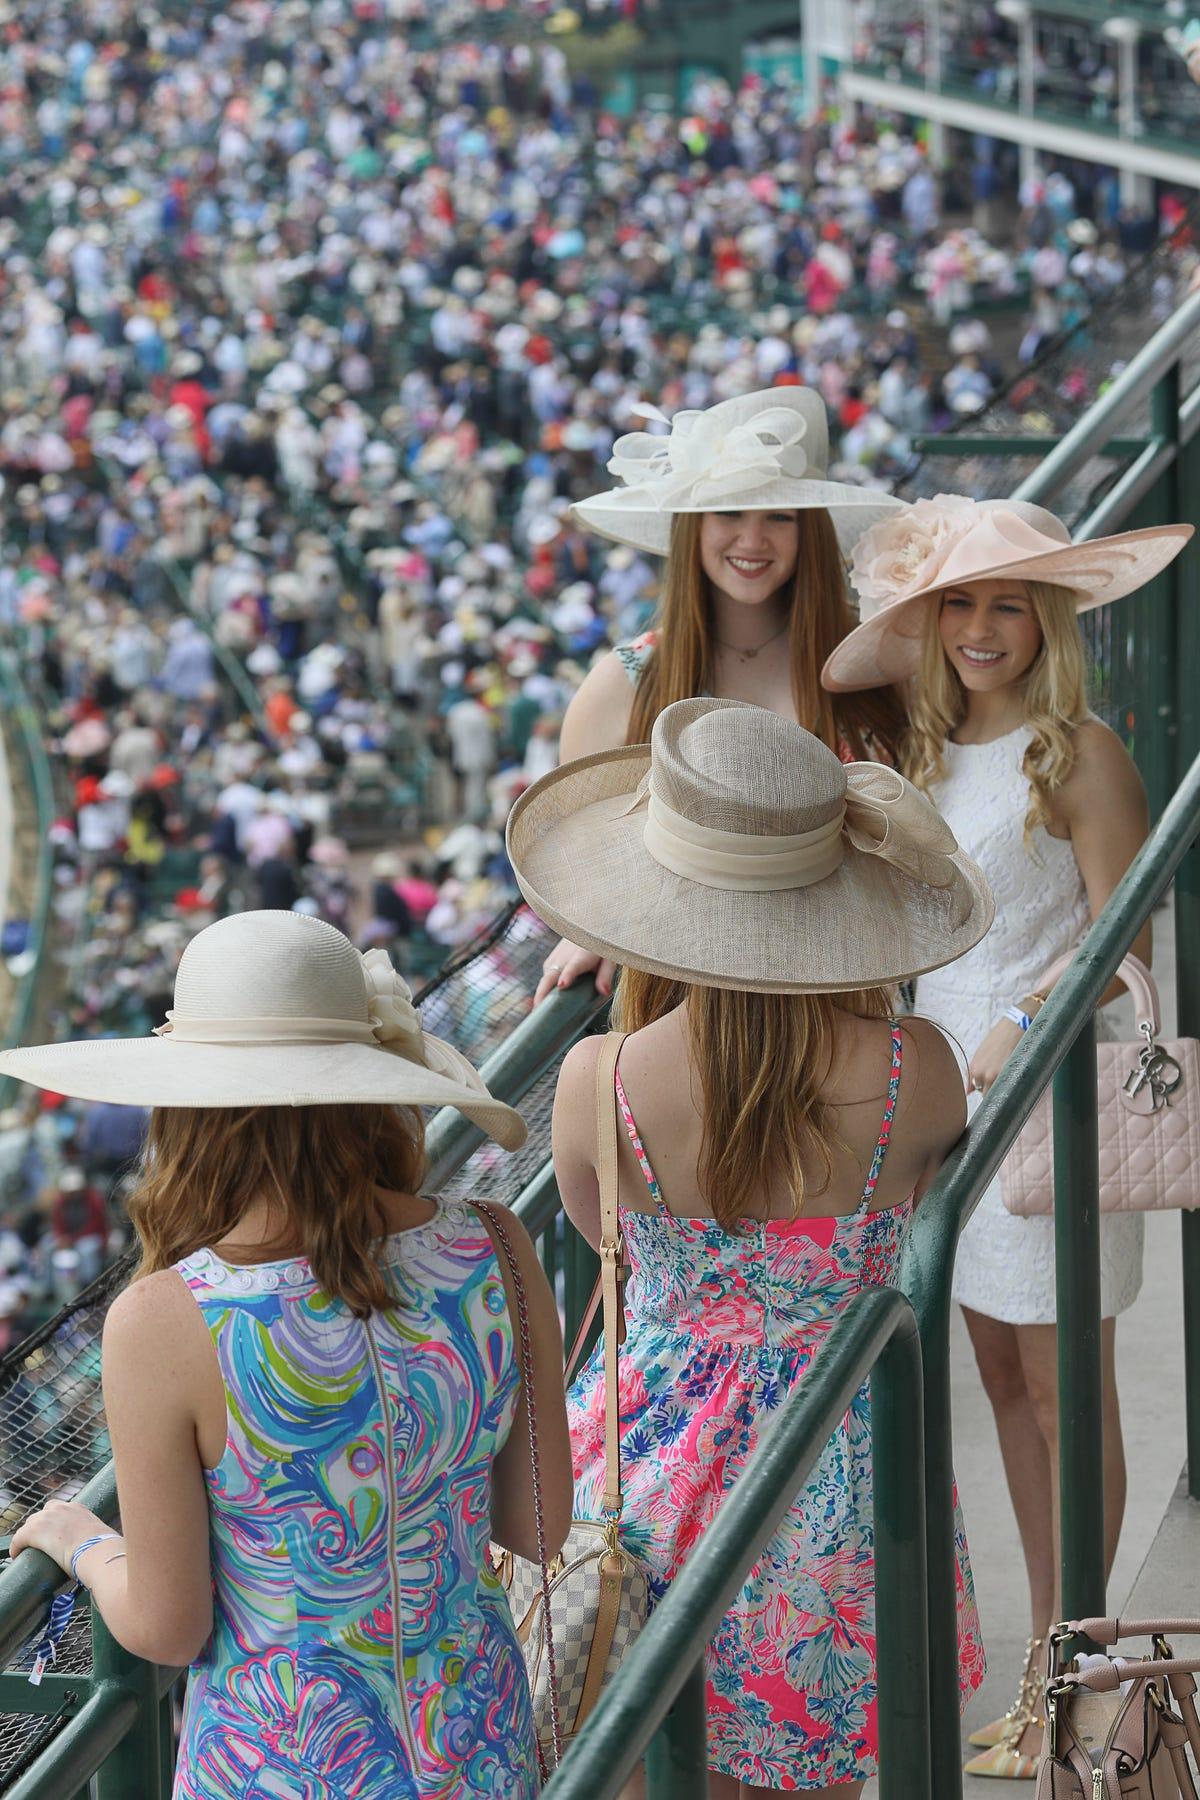 da539ba4b Kentucky Derby fashion: hats, dresses, ties & what not to wear